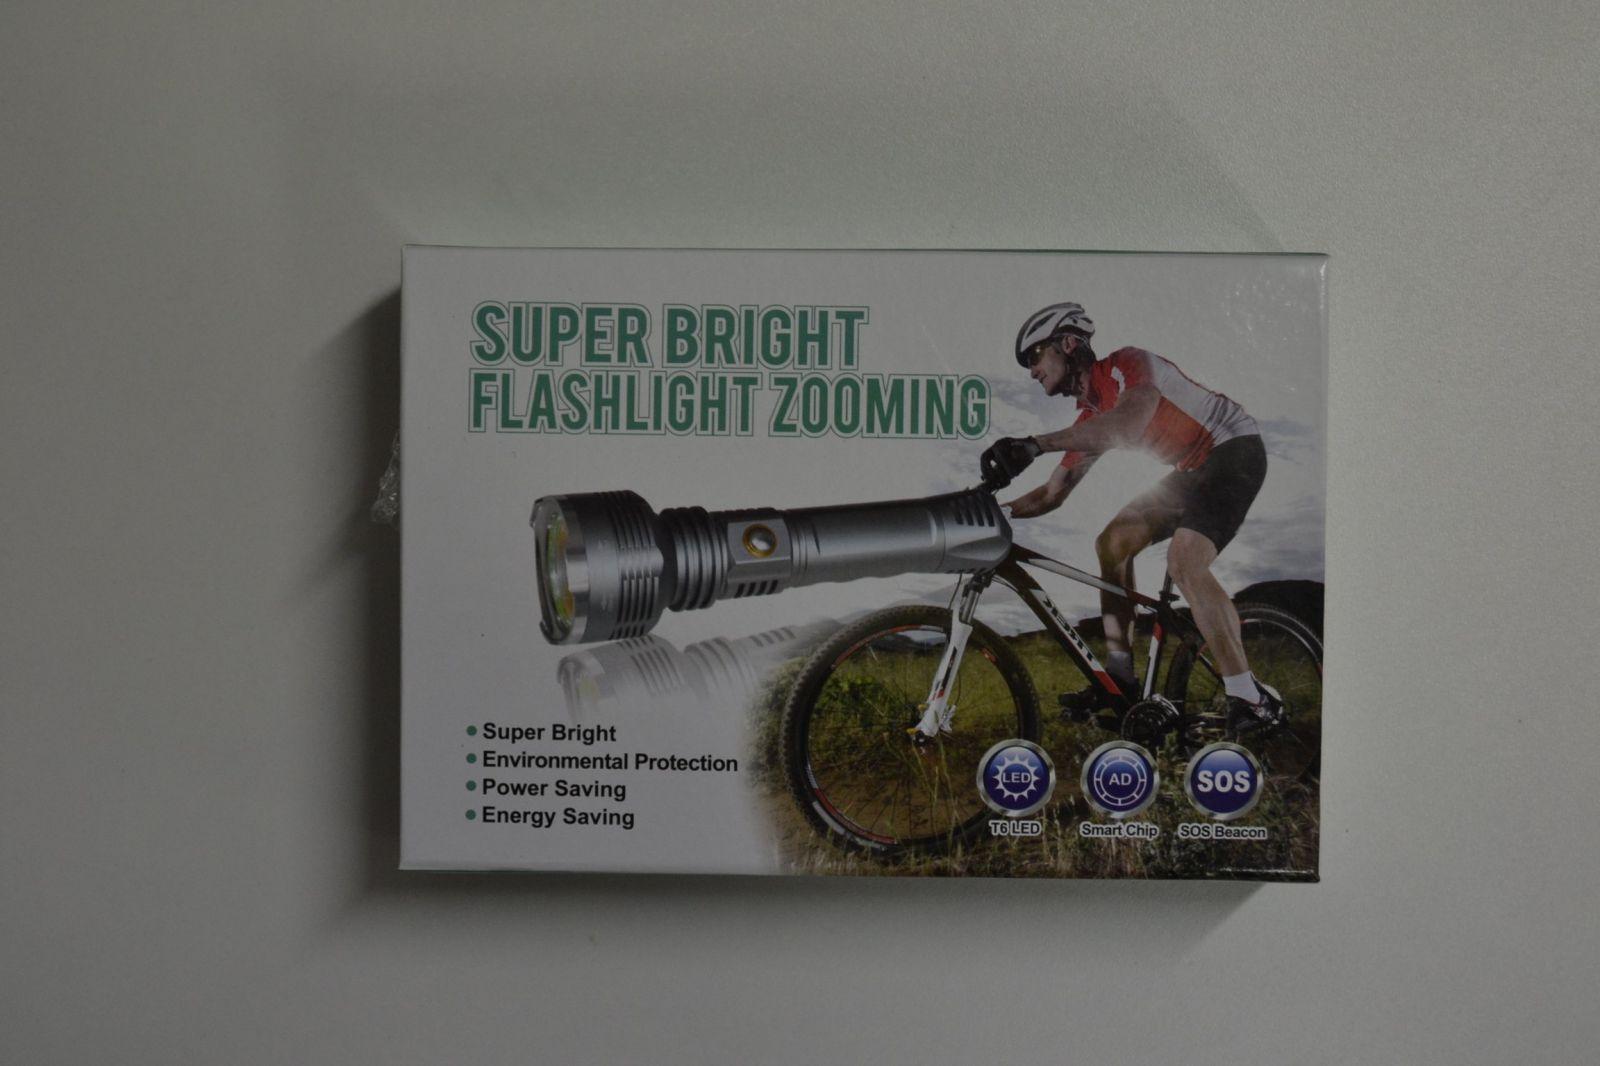 Aku svítilna super bright flashlight zooming